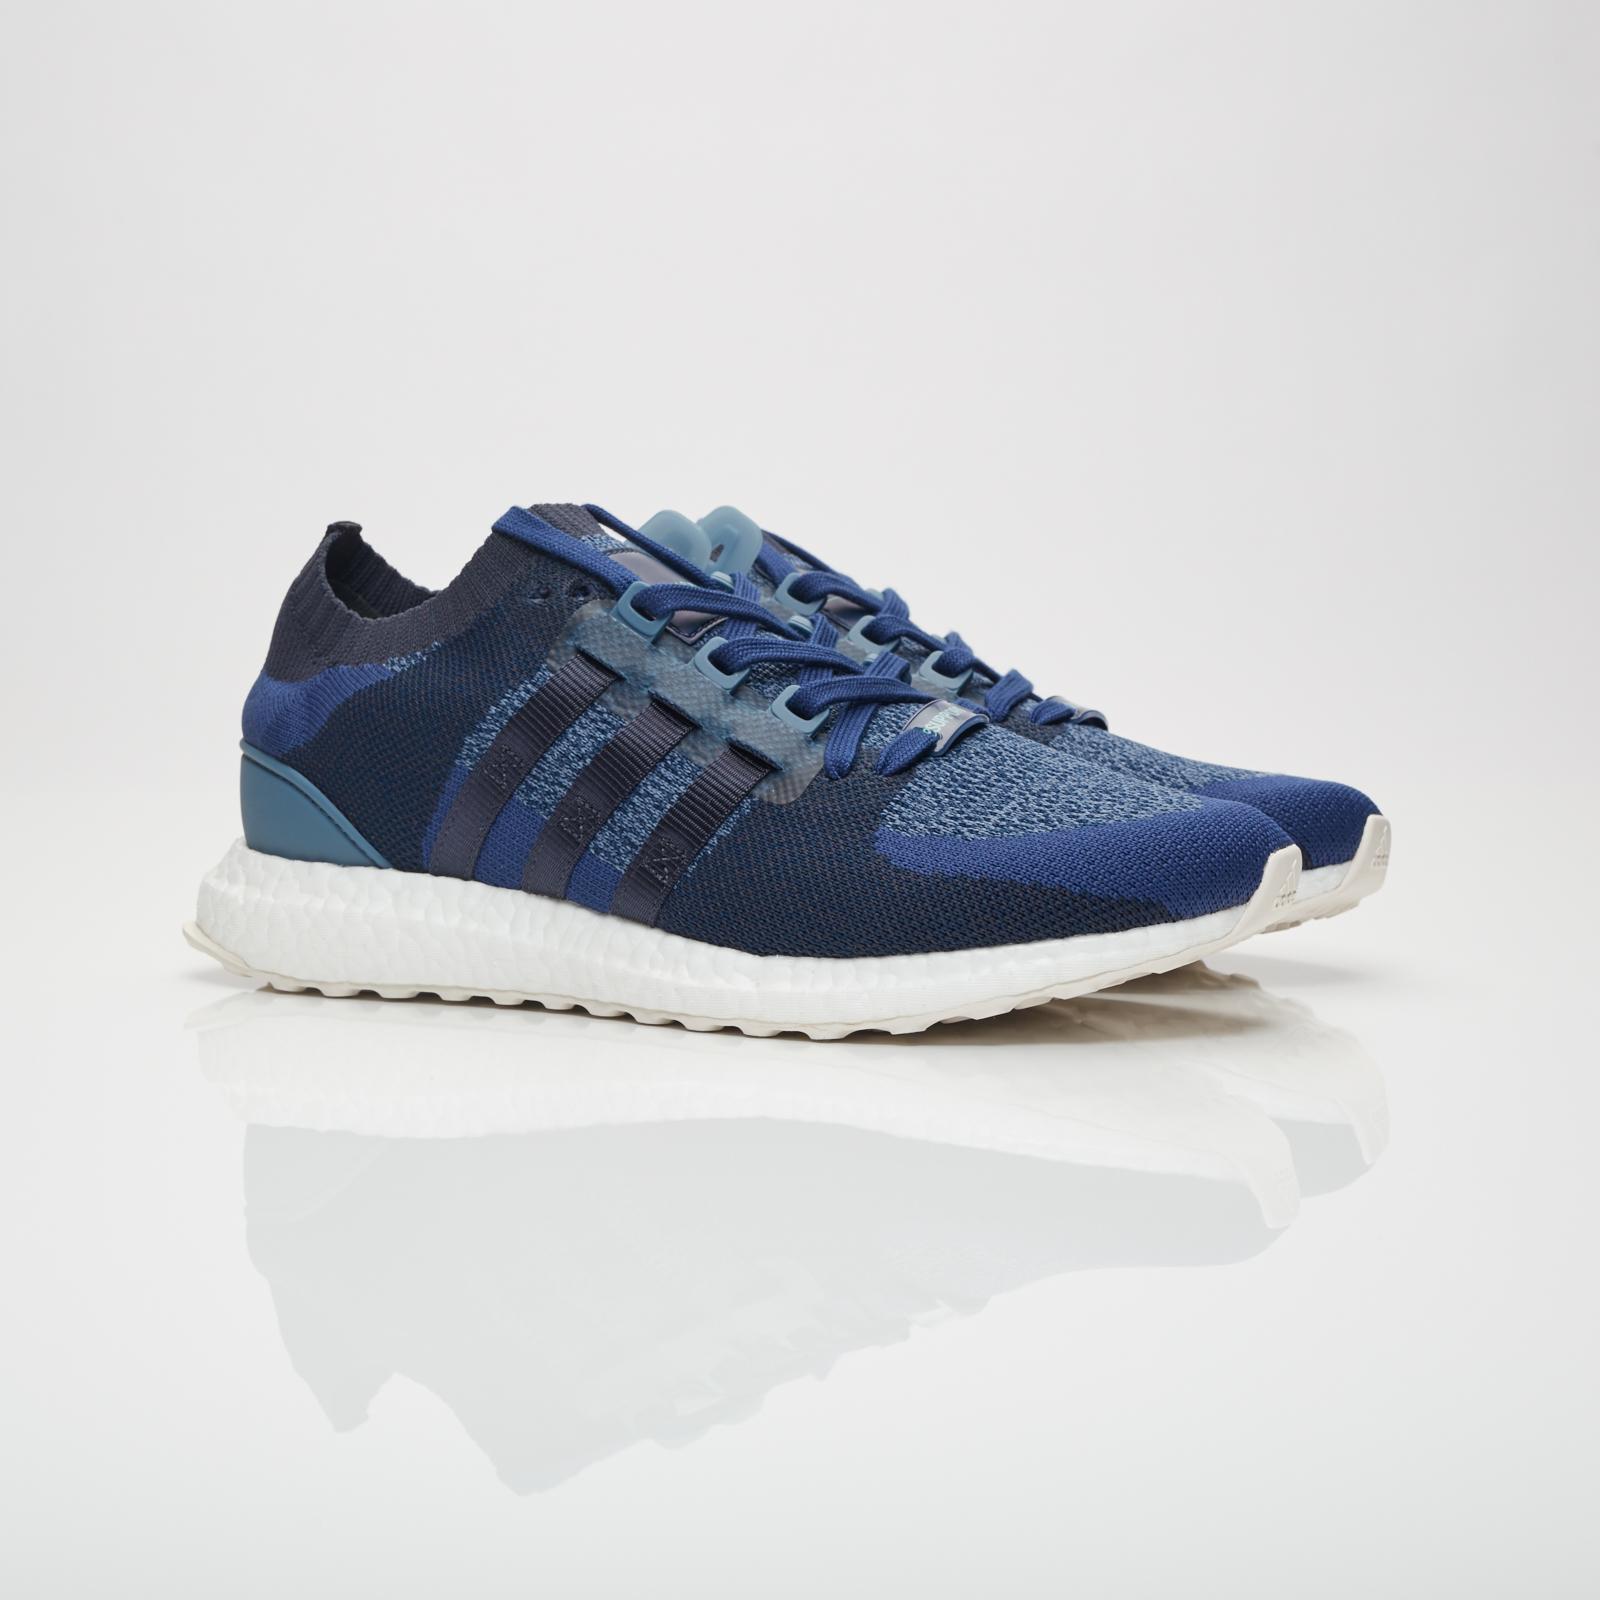 324f09730c4 adidas EQT Support Ultra Primeknit - Cq1895 - Sneakersnstuff ...